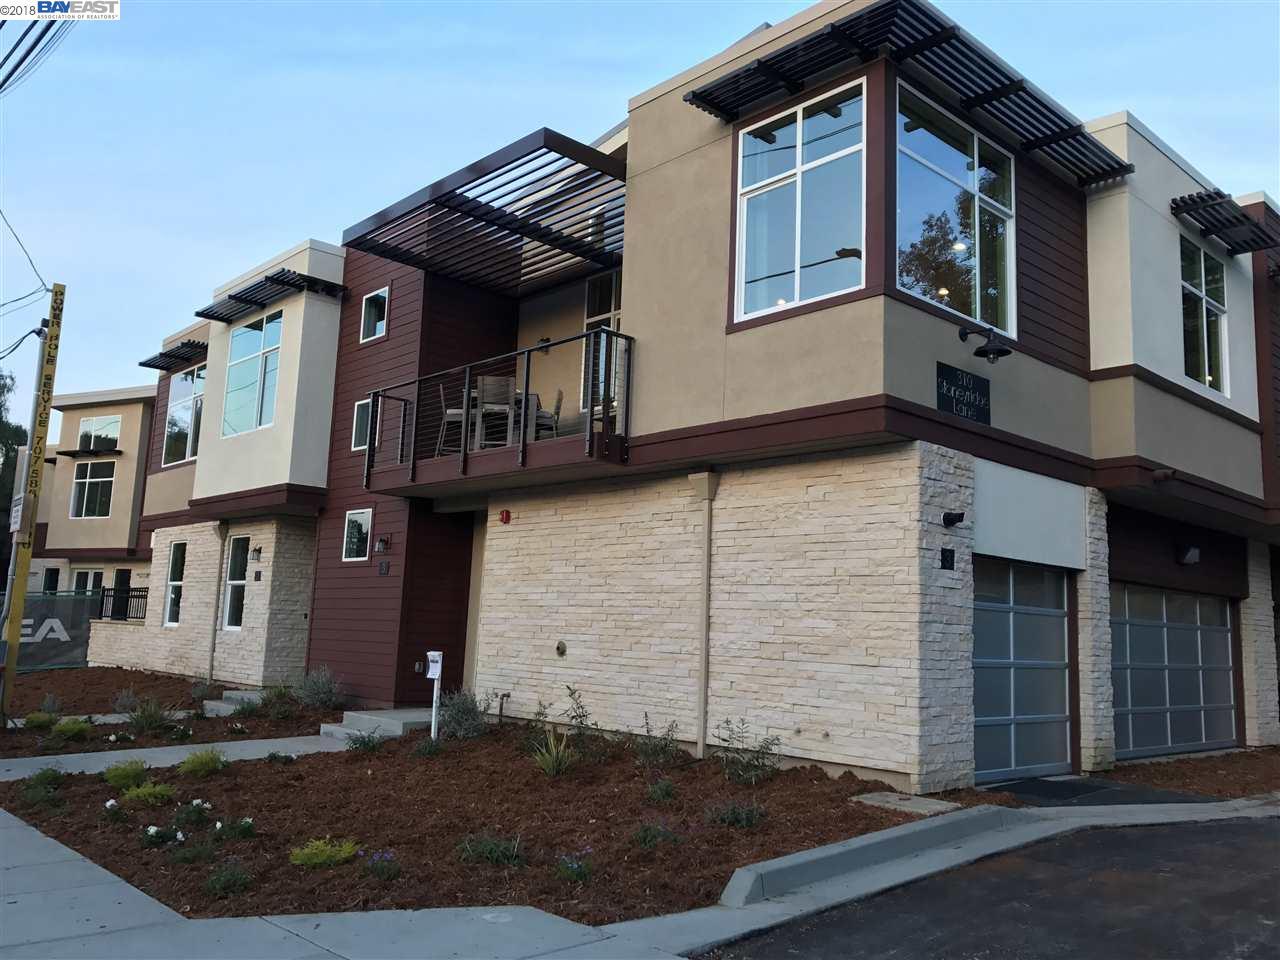 Condominium for Sale at 325 Stoneyridge Lane 325 Stoneyridge Lane Walnut Creek, California 94596 United States